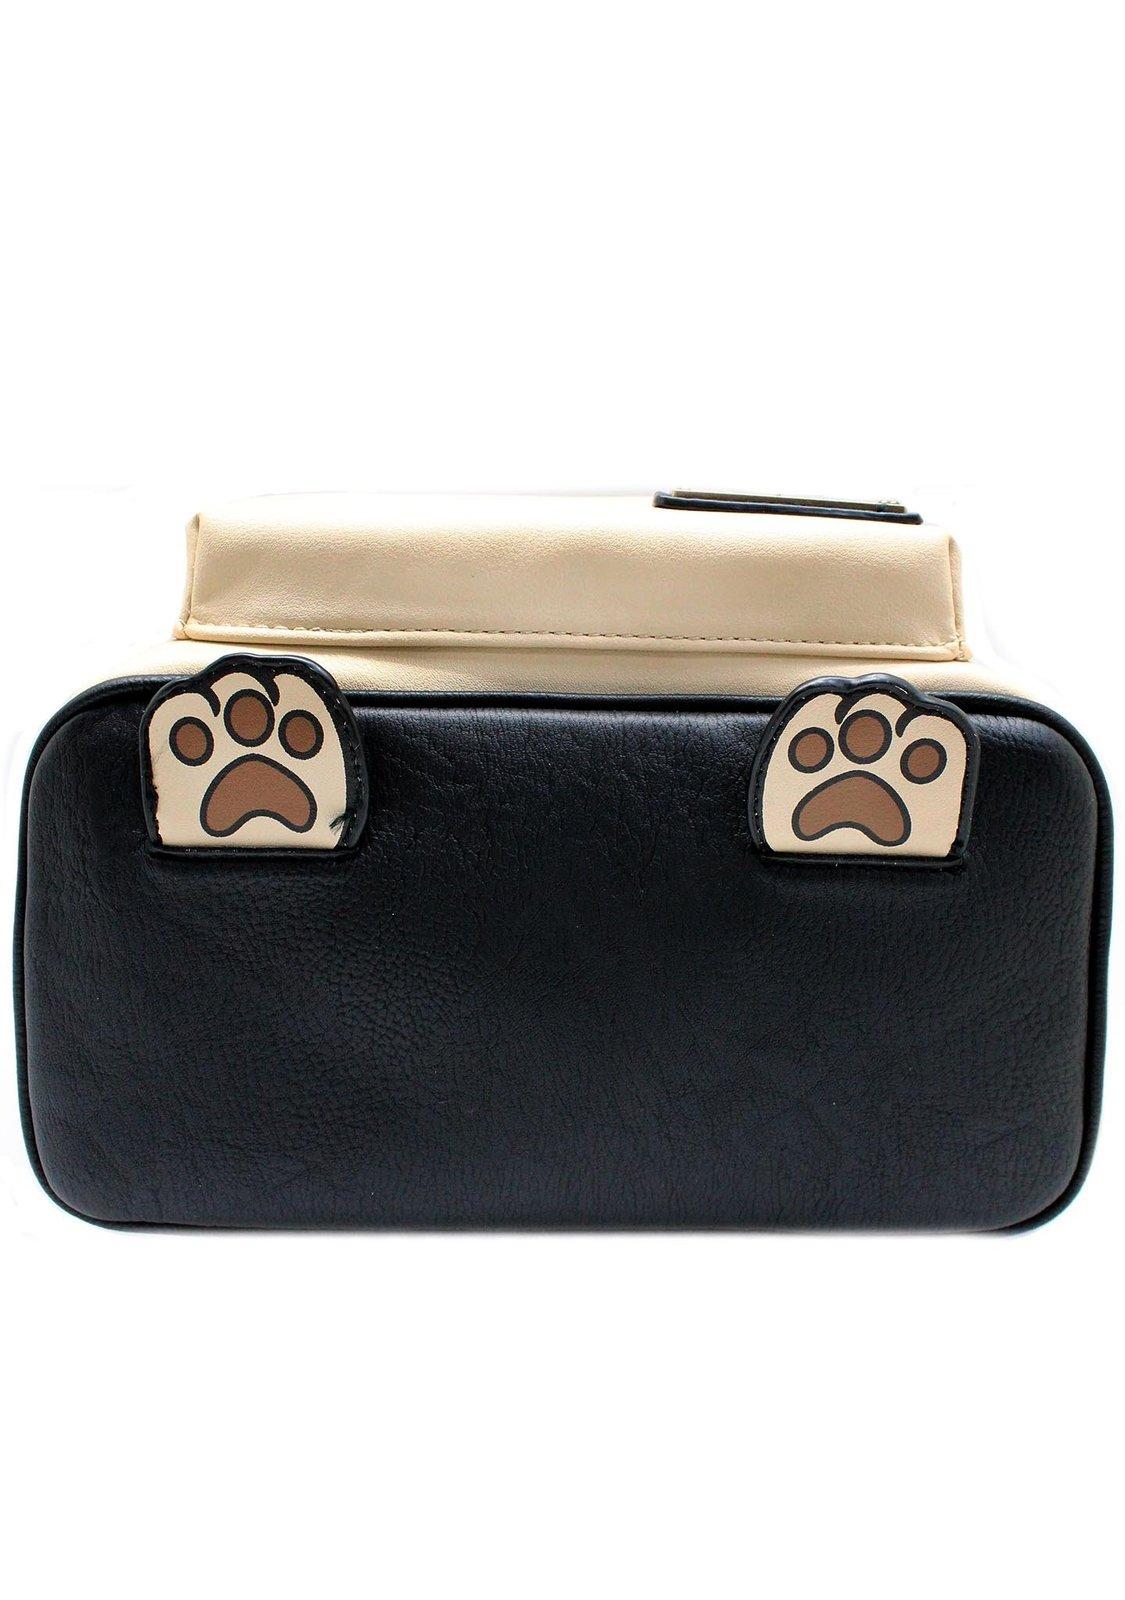 Loungefly: Pug Mini Backpack image